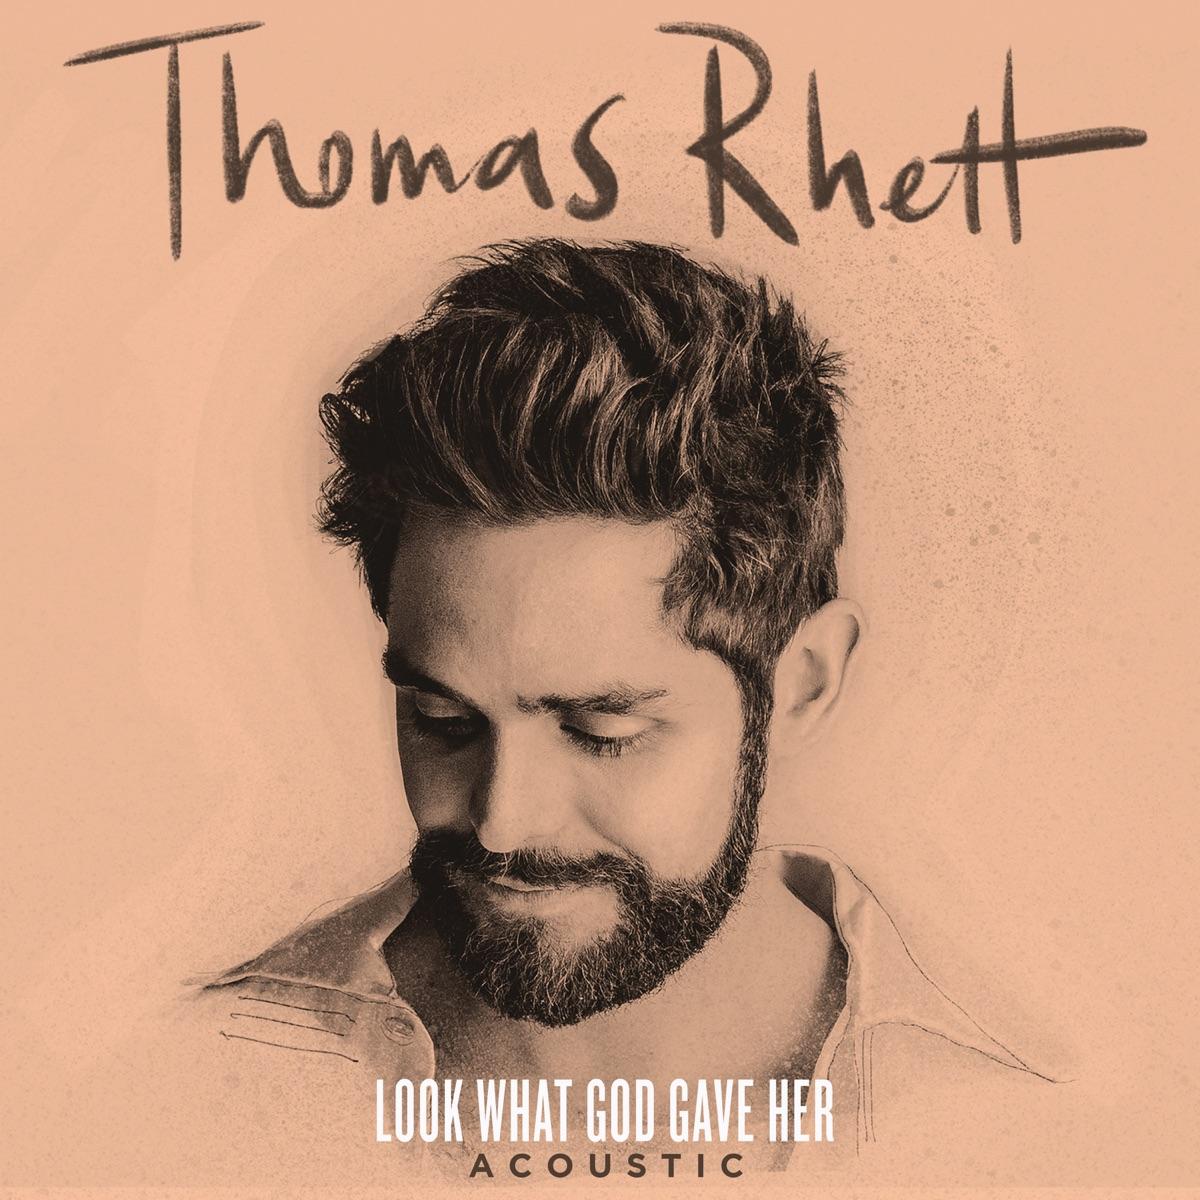 Look What God Gave Her Acoustic - Single Thomas Rhett CD cover